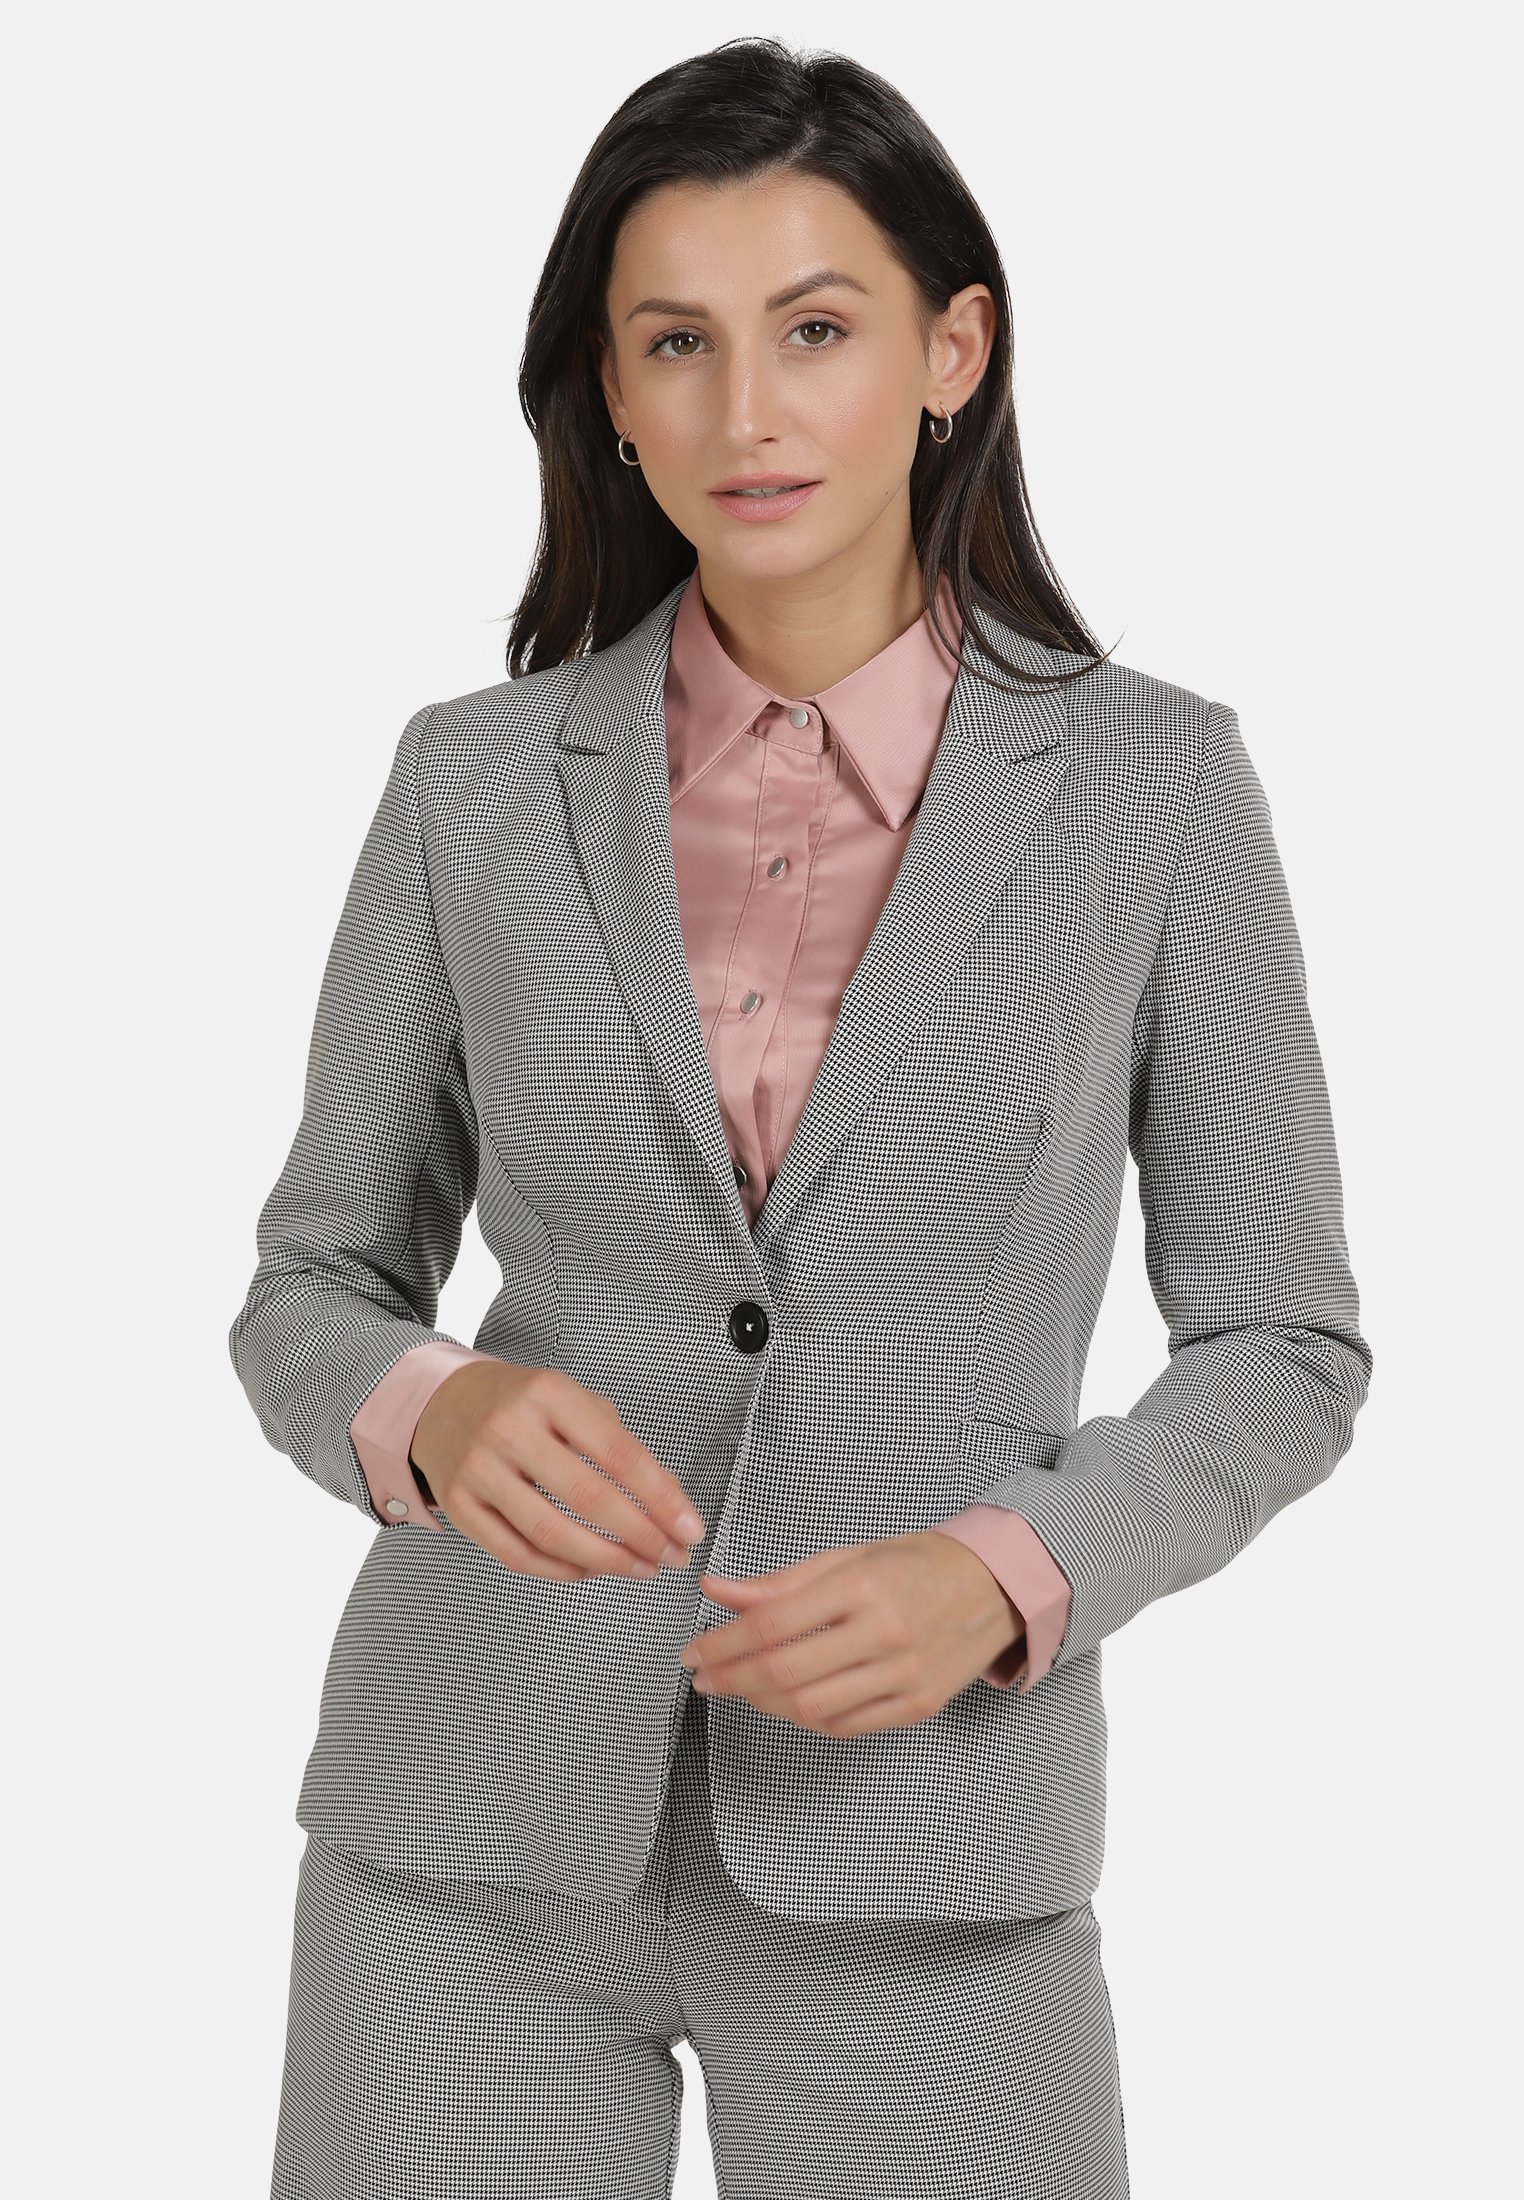 Sale Women's Clothing usha Blazer schwarz weiss qhaUqjoSe